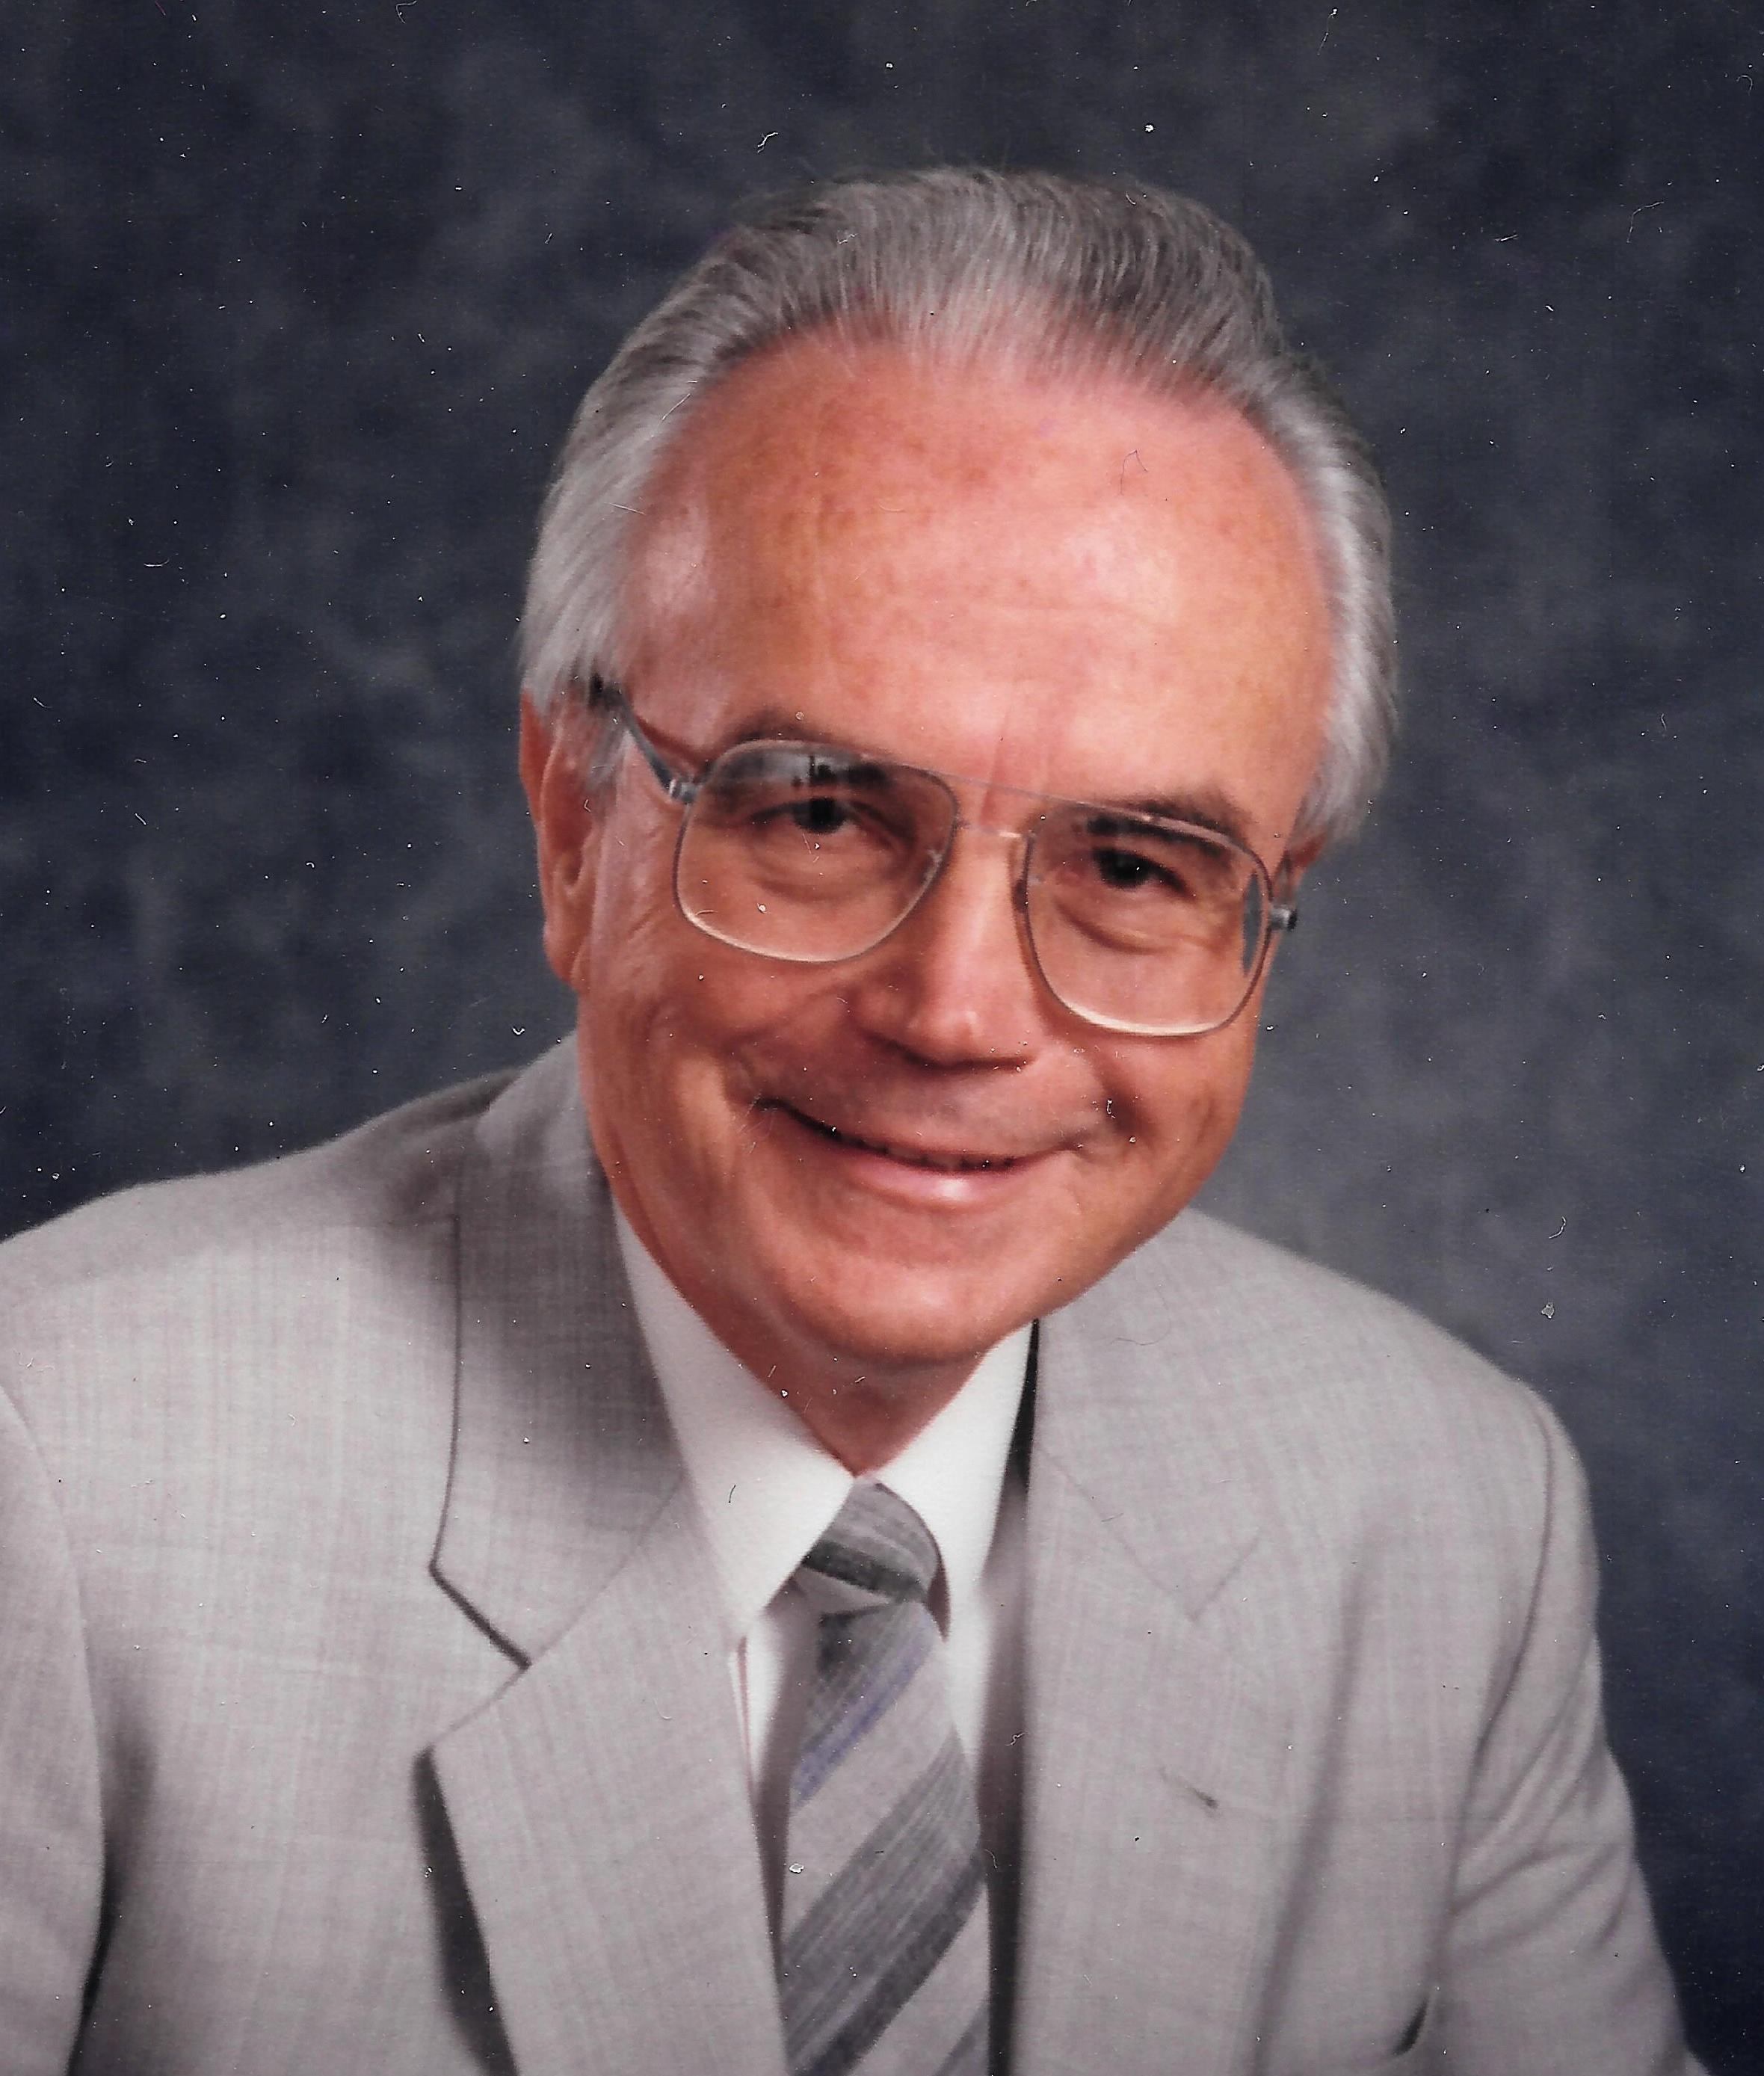 Glenn Durland Paige